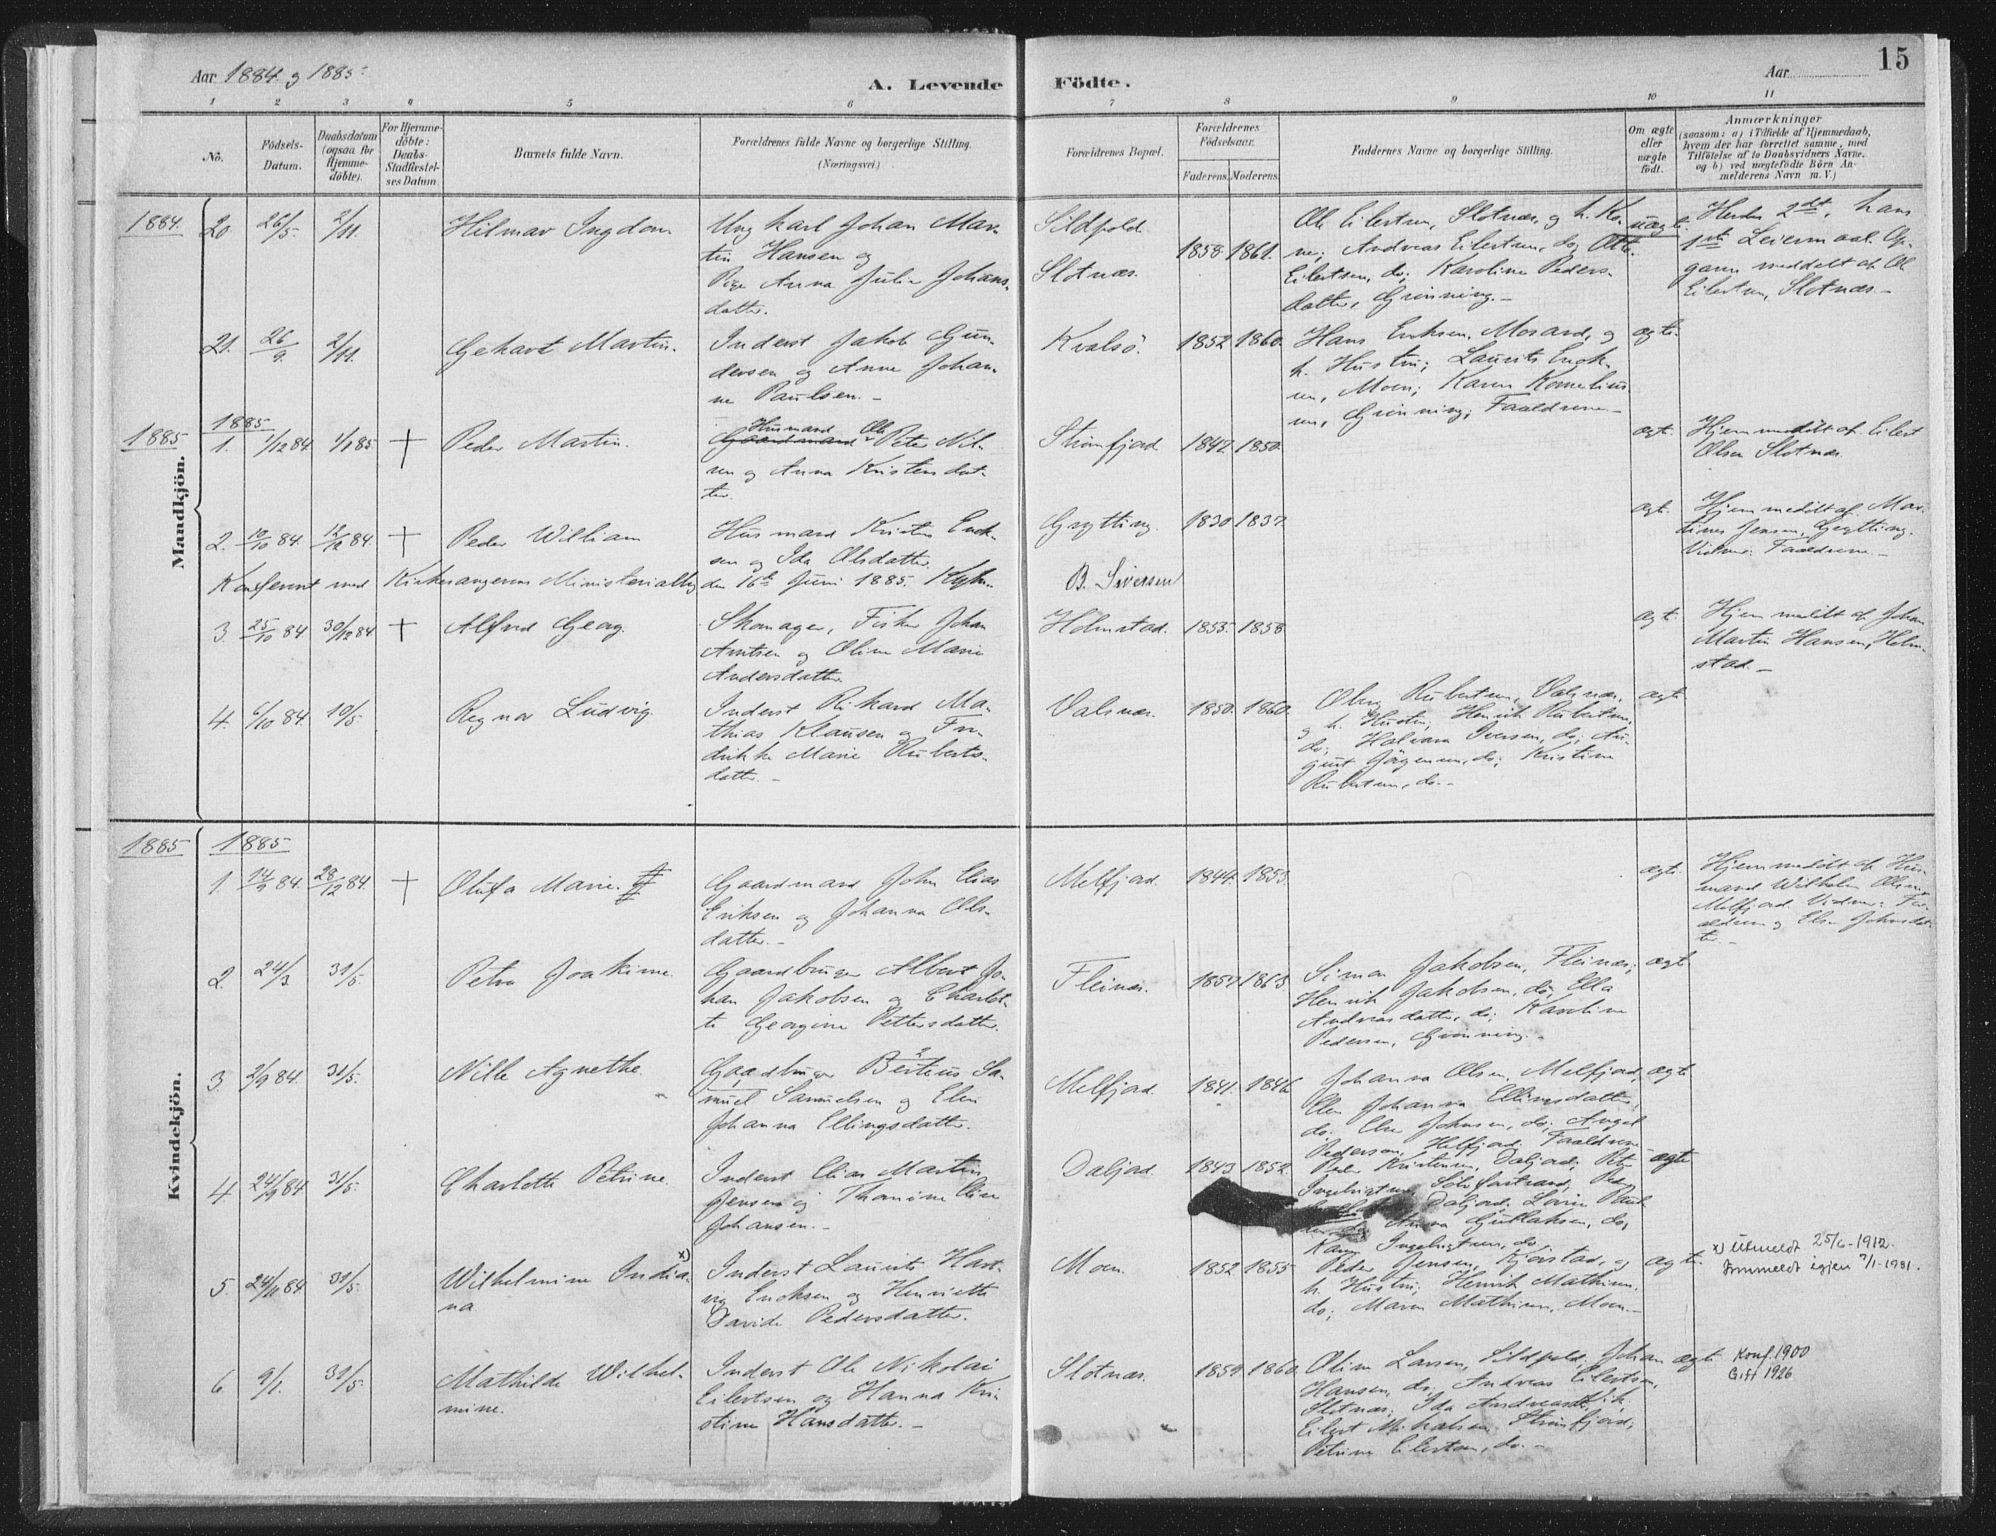 SAT, Ministerialprotokoller, klokkerbøker og fødselsregistre - Nordland, 890/L1286: Ministerialbok nr. 890A01, 1882-1902, s. 15